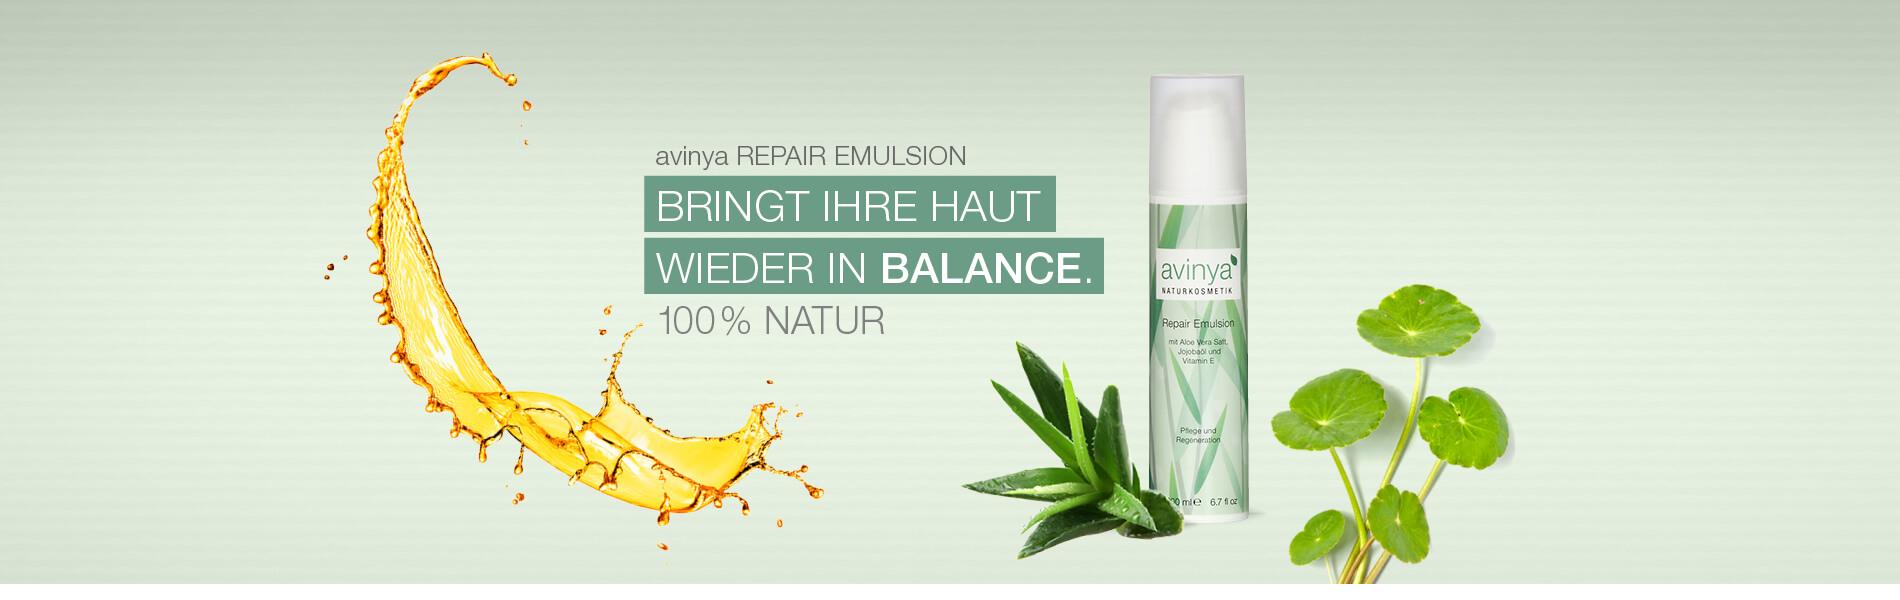 avinya REPAIR EMULSION - Bringt die Haut wieder in Balance.